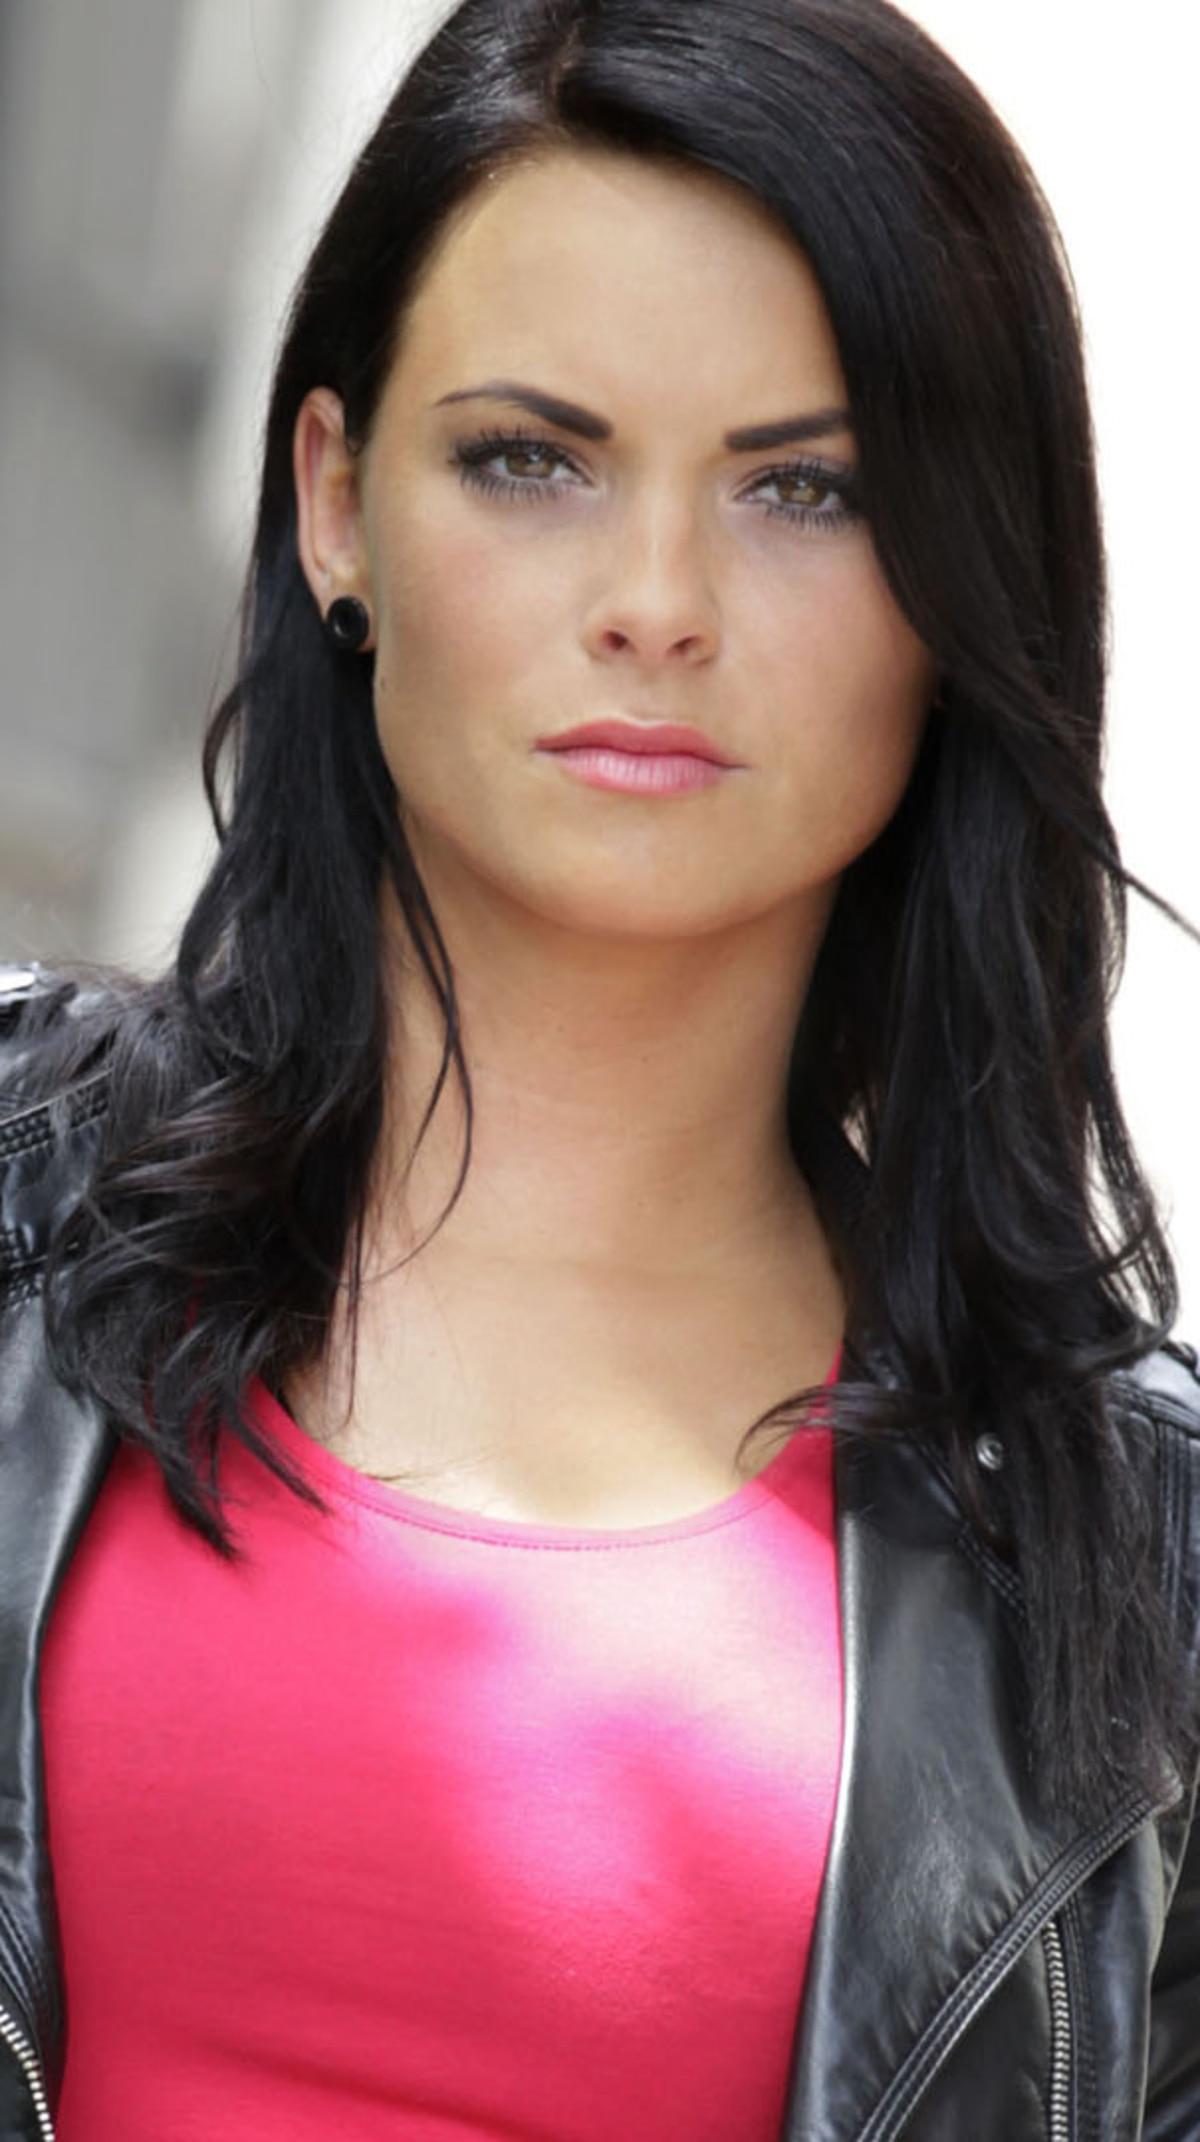 Cora Reinhardt